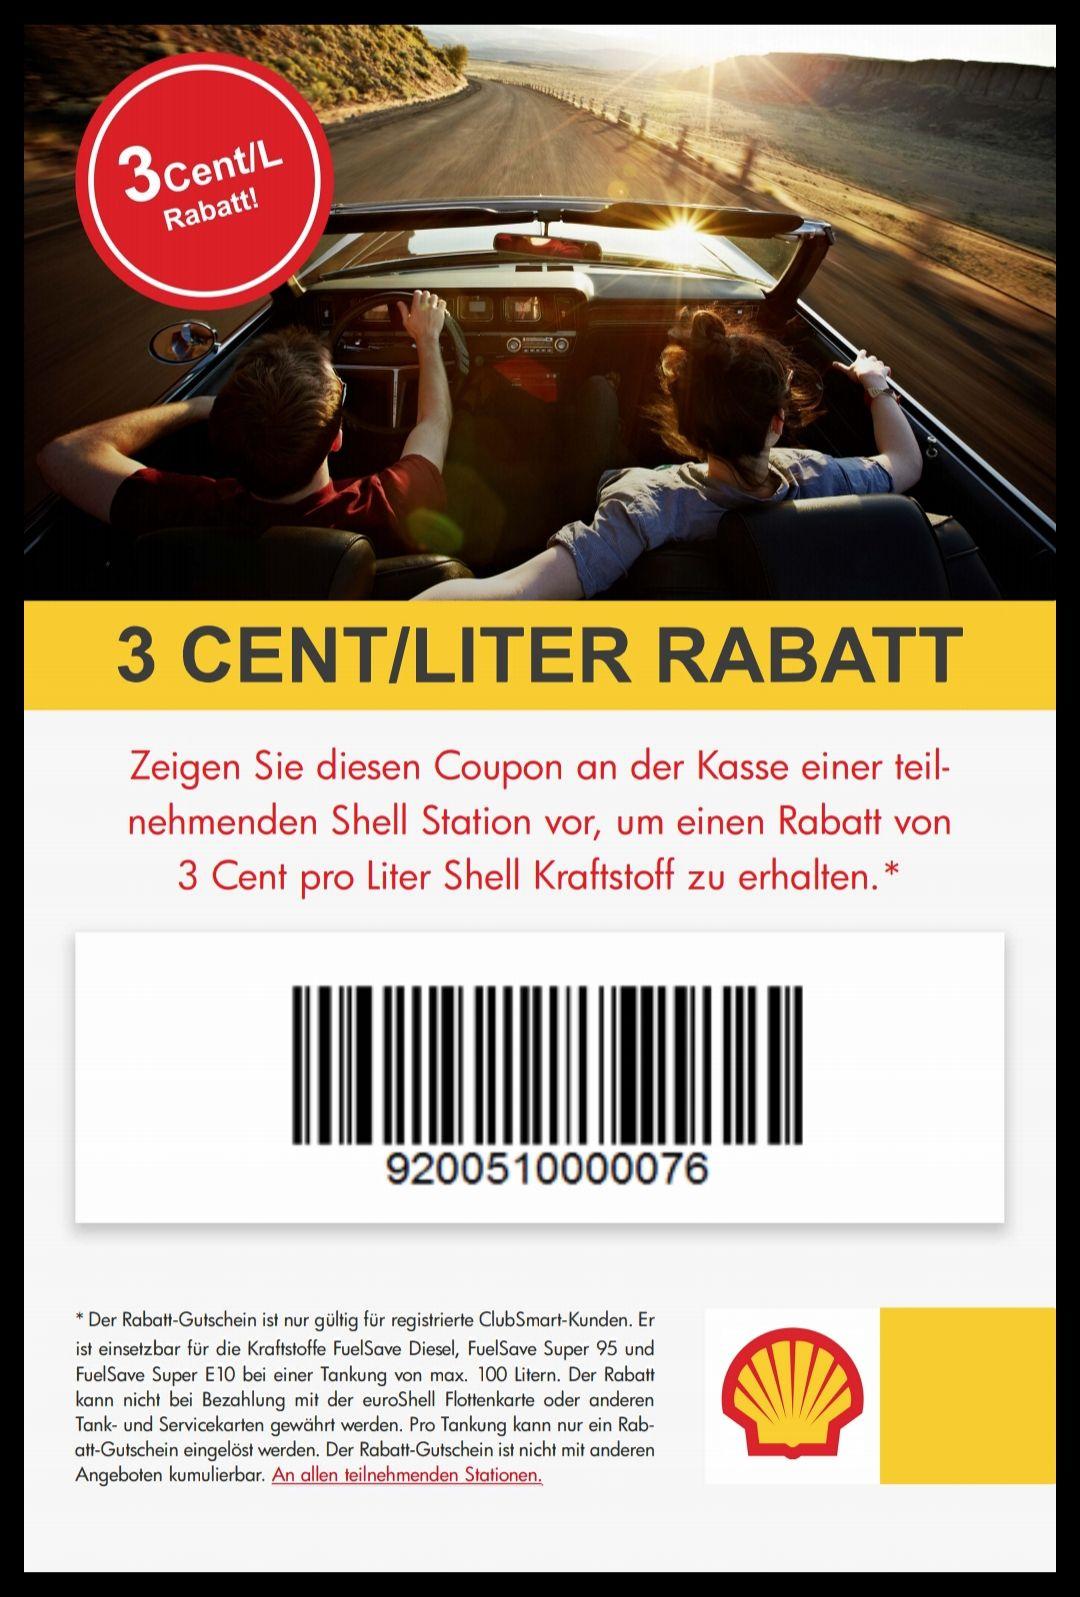 Shell - 3 Cent Rabatt pro Liter (ClubSmart Mitglied)